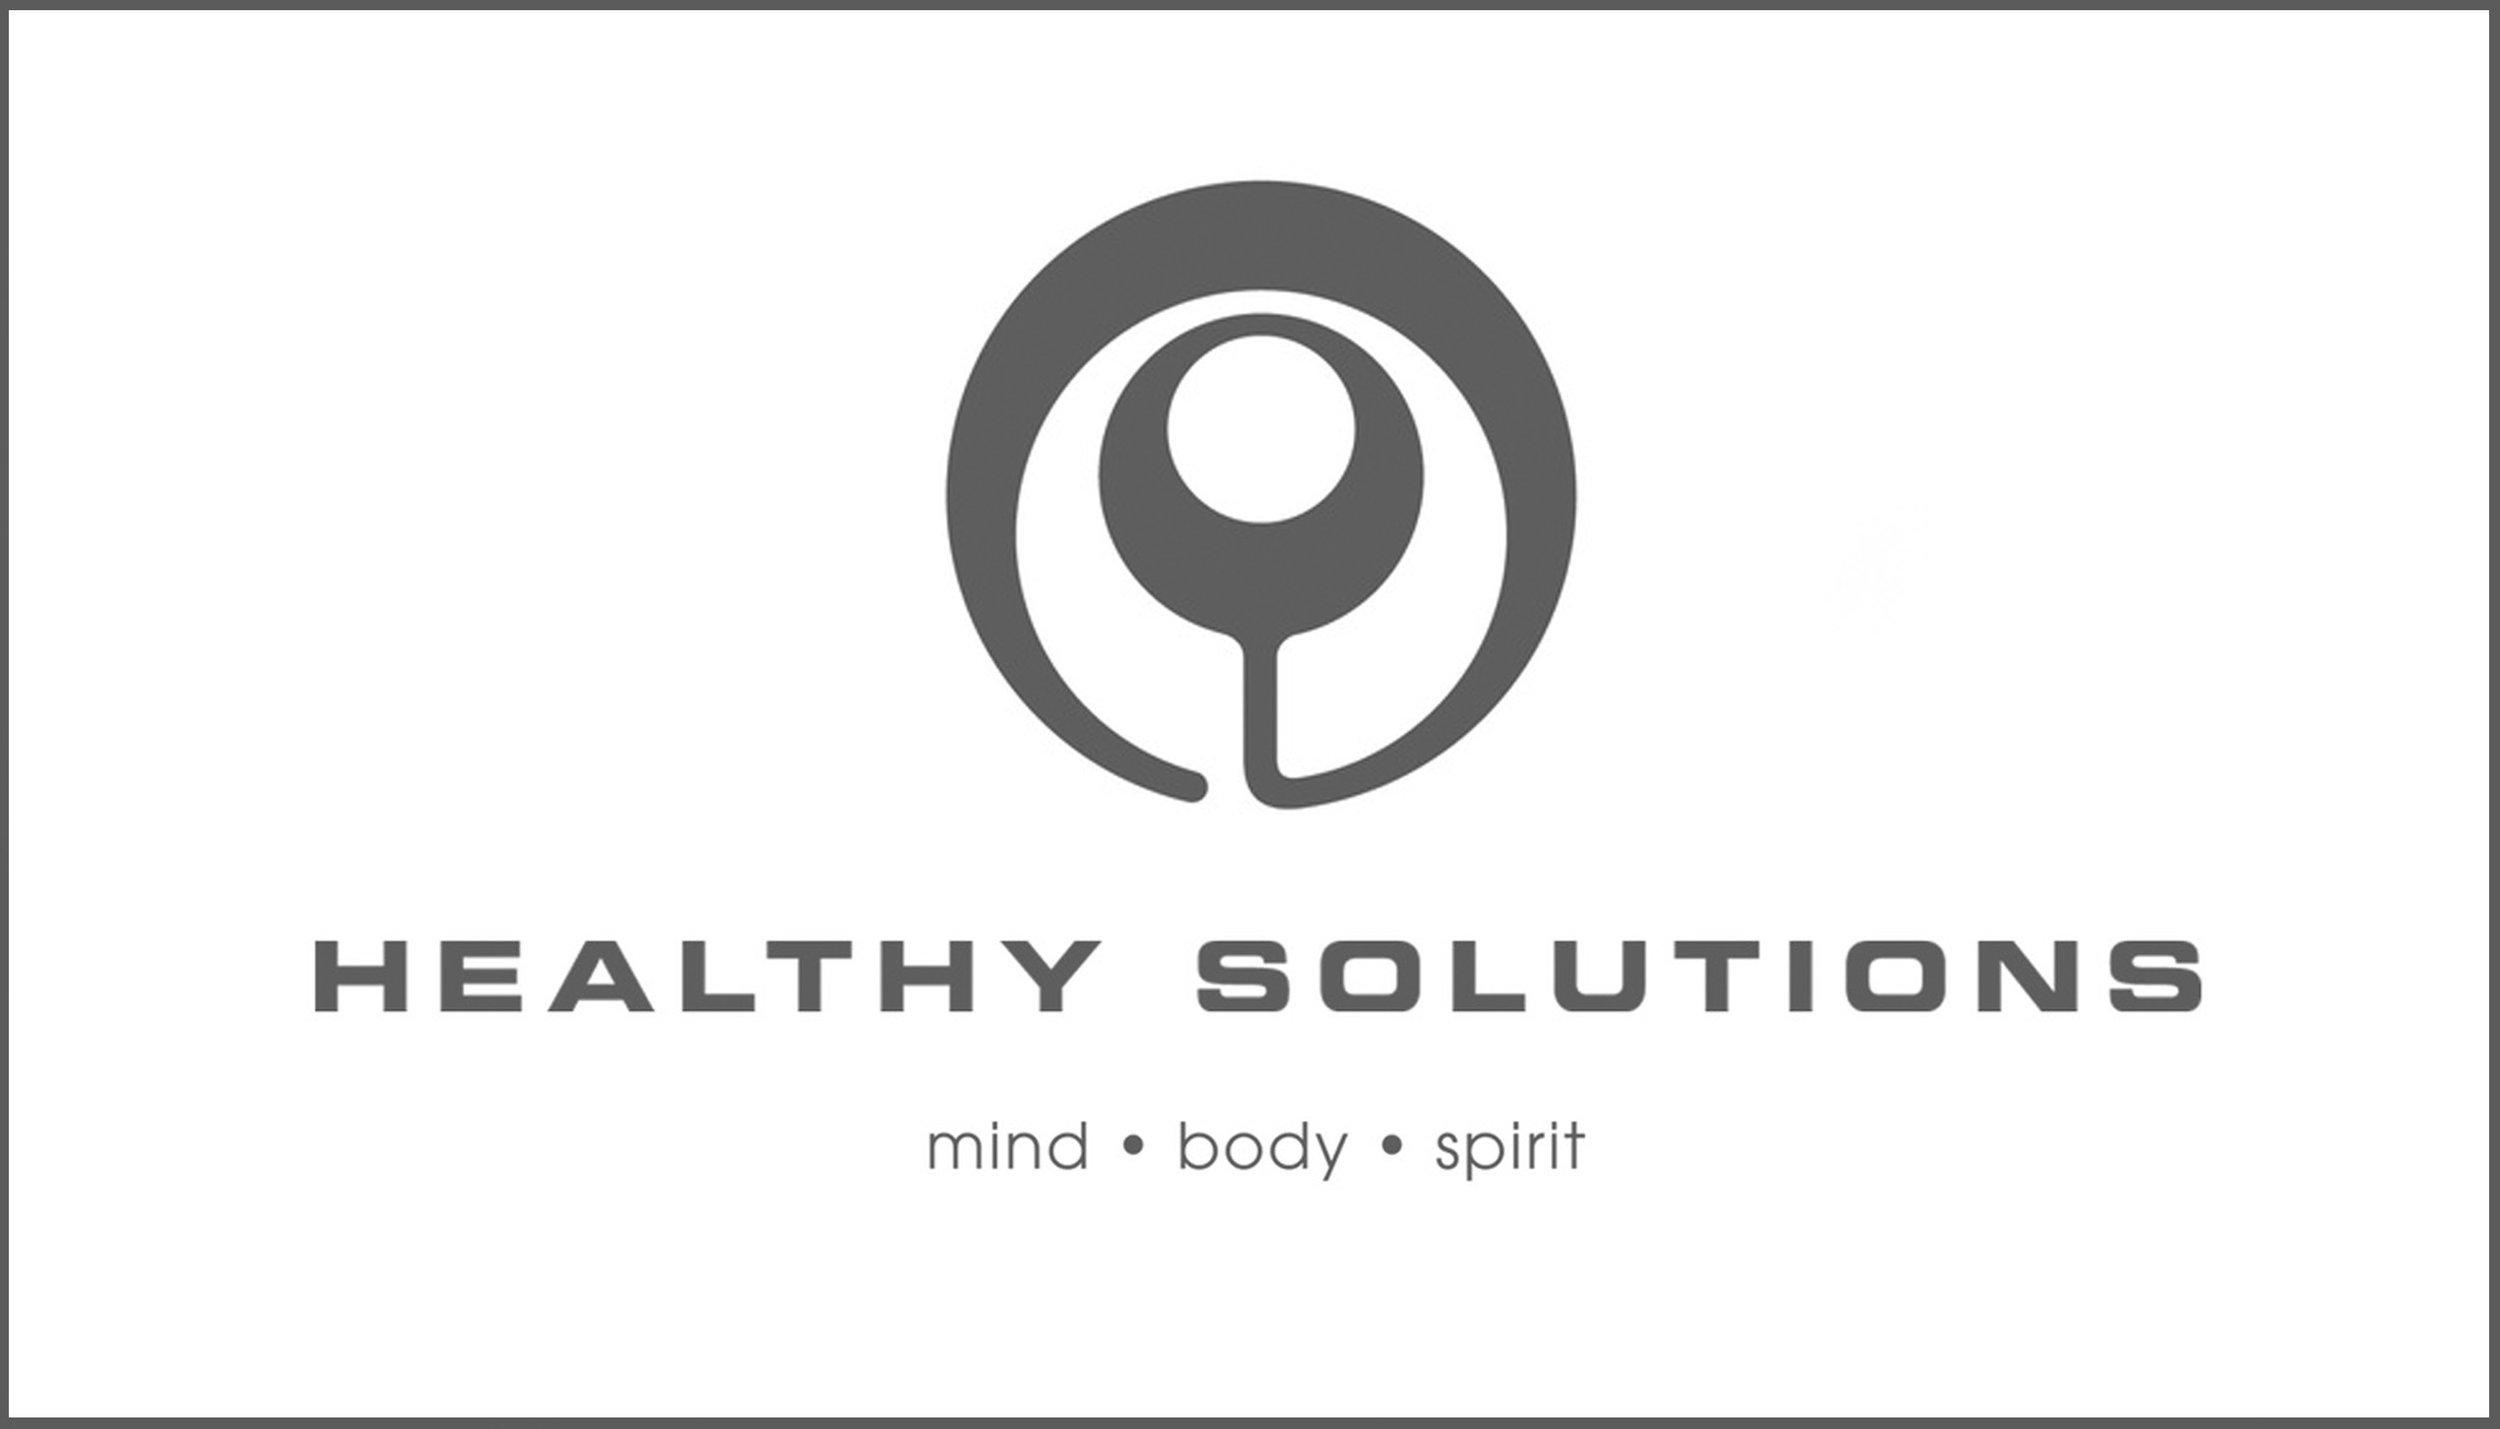 healthy solutions.jpg